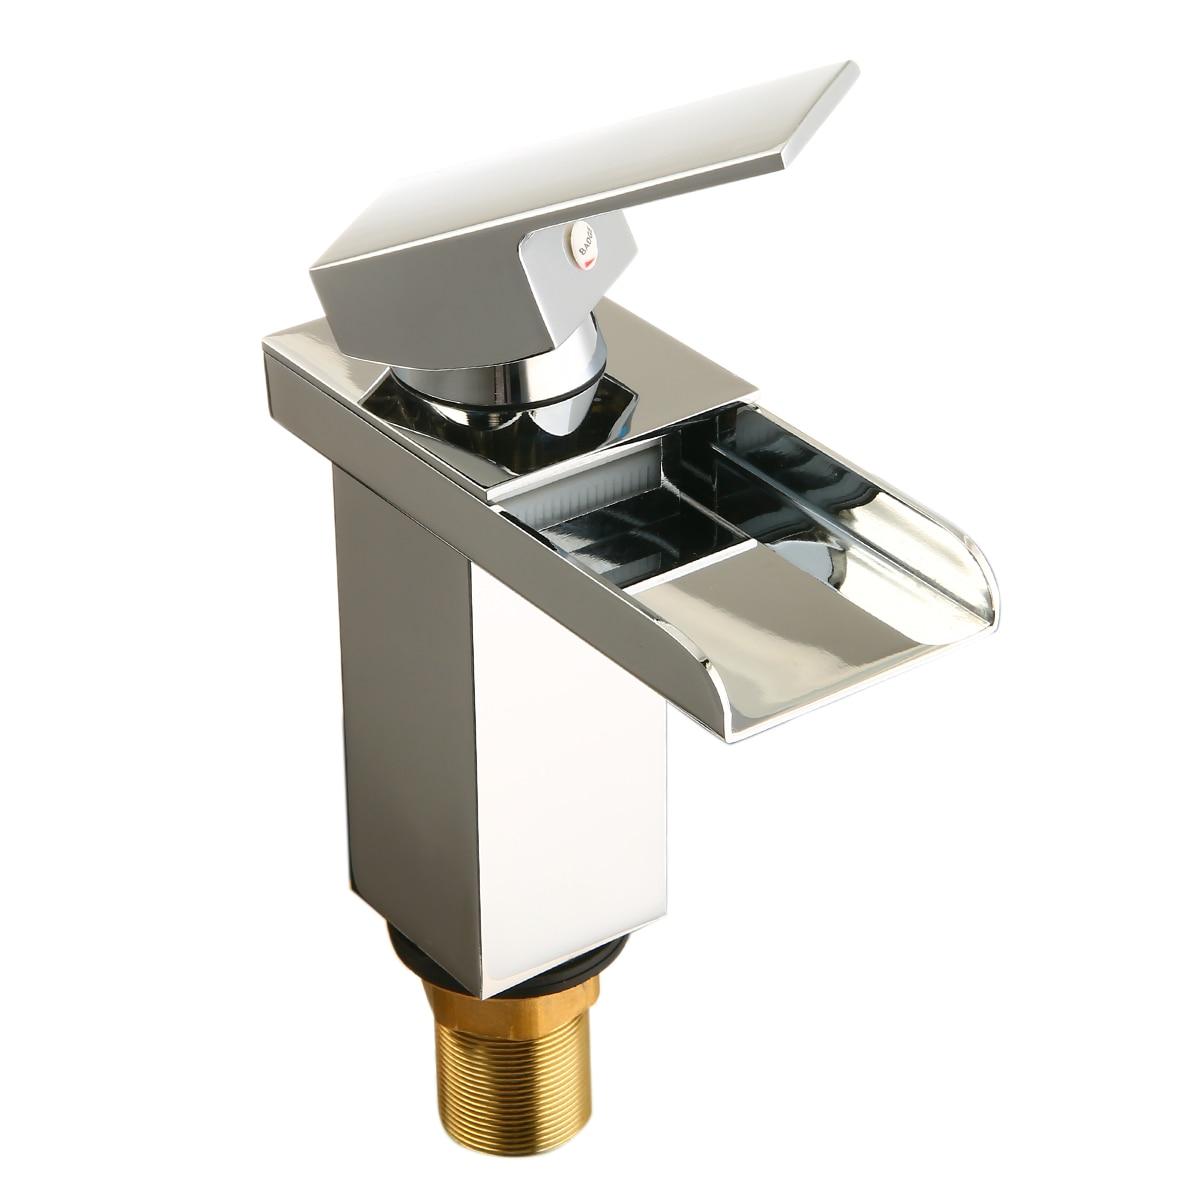 Aliexpress.com : Buy Bathroom Waterfall Faucet Waterfall ...